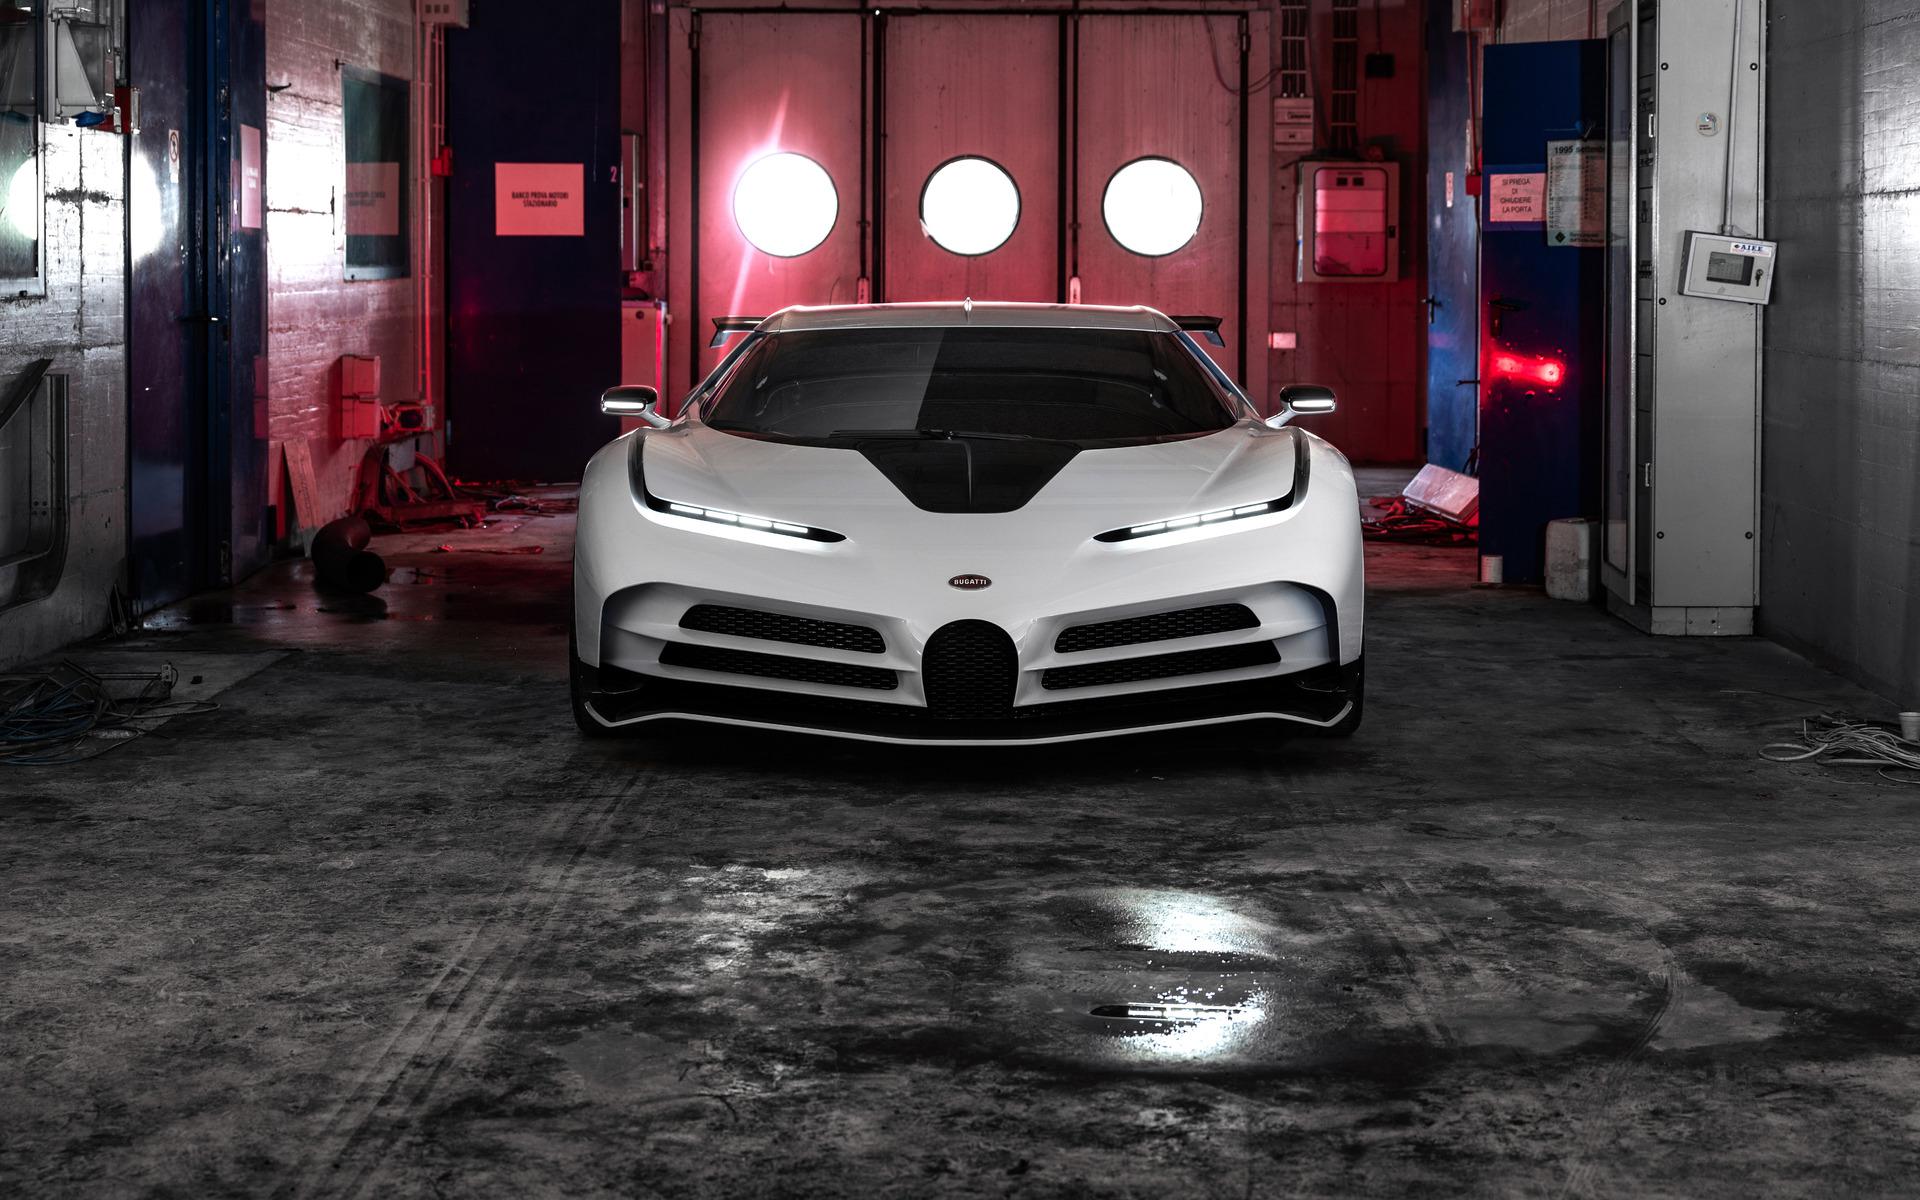 2020-bugatti-centodieci-8k-7k.jpg